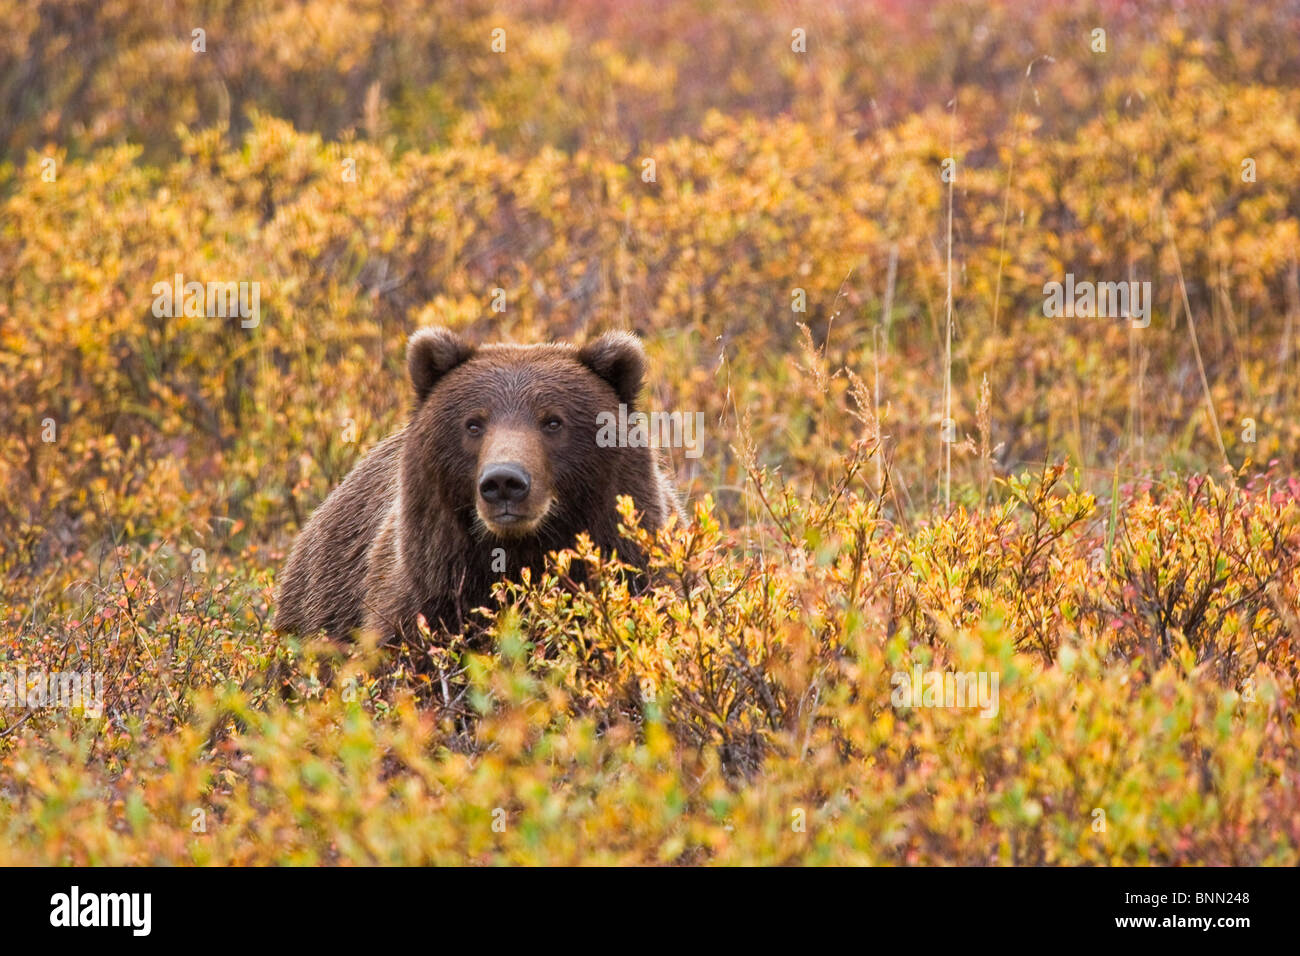 Portrait of an adult brown bear amongst the fall foliage in Denali National Park, Alaska, Autumn Stock Photo